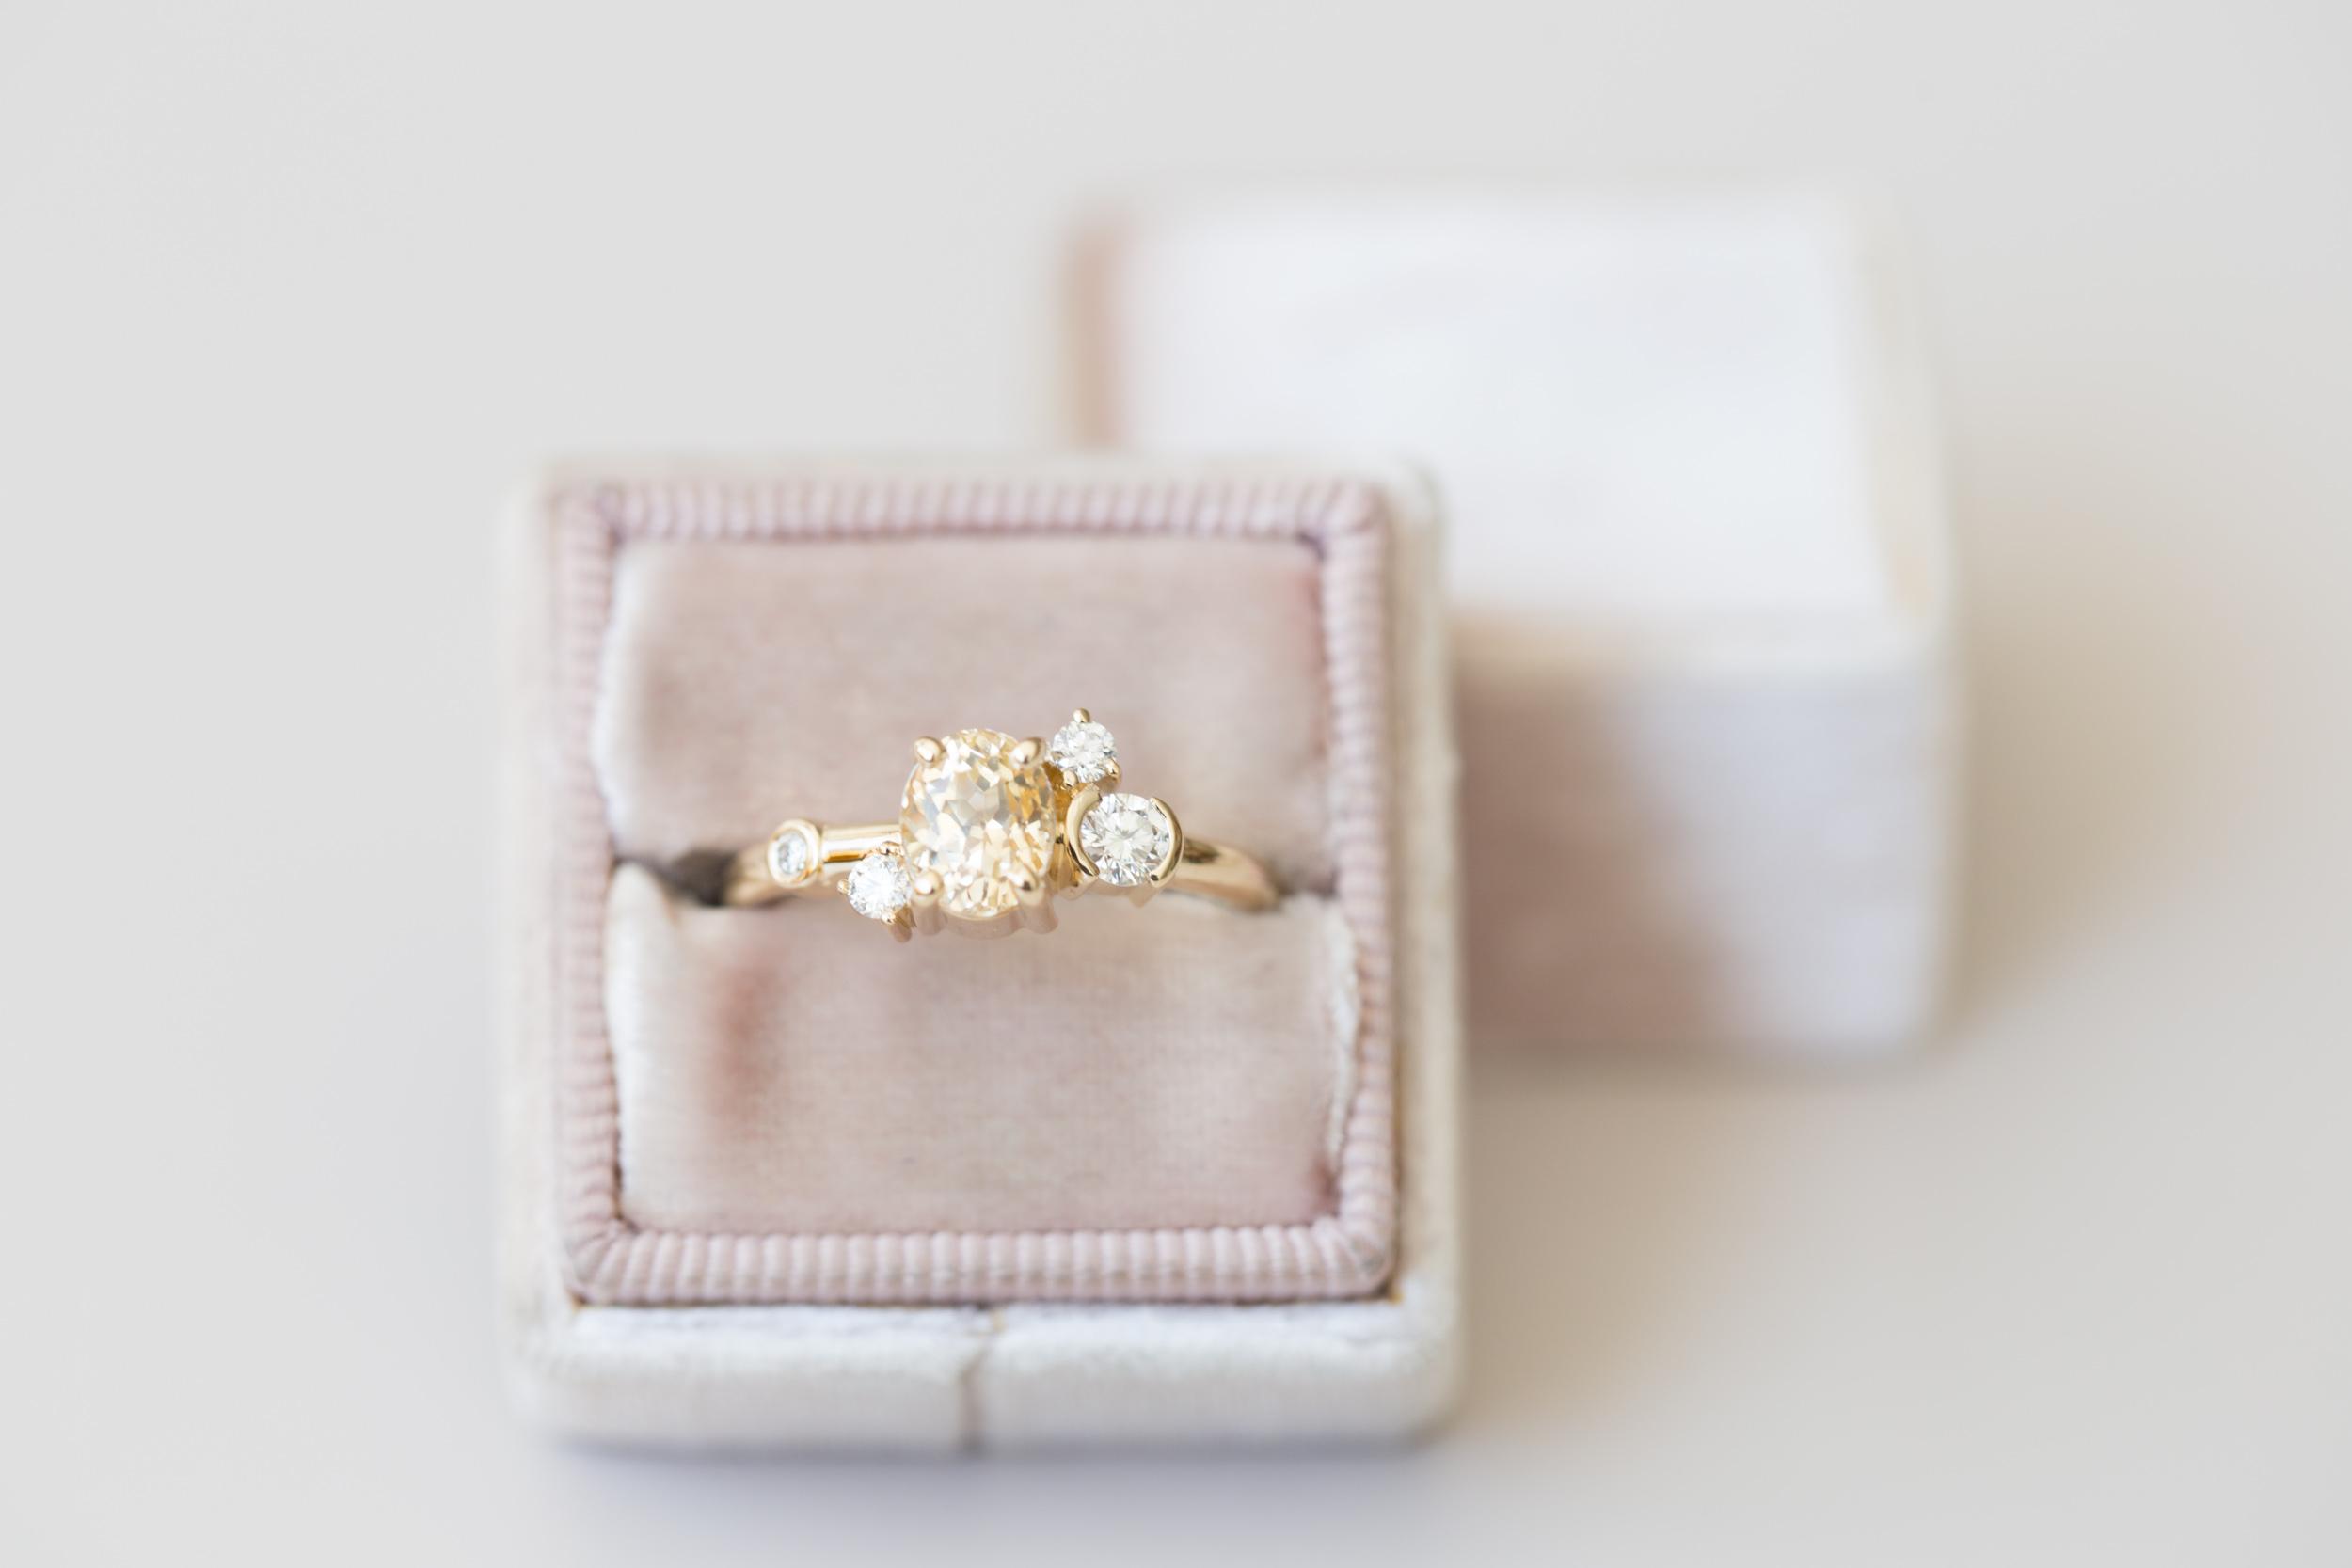 Lana + Max Sapphire Diamond Cluster Ring-5.jpg